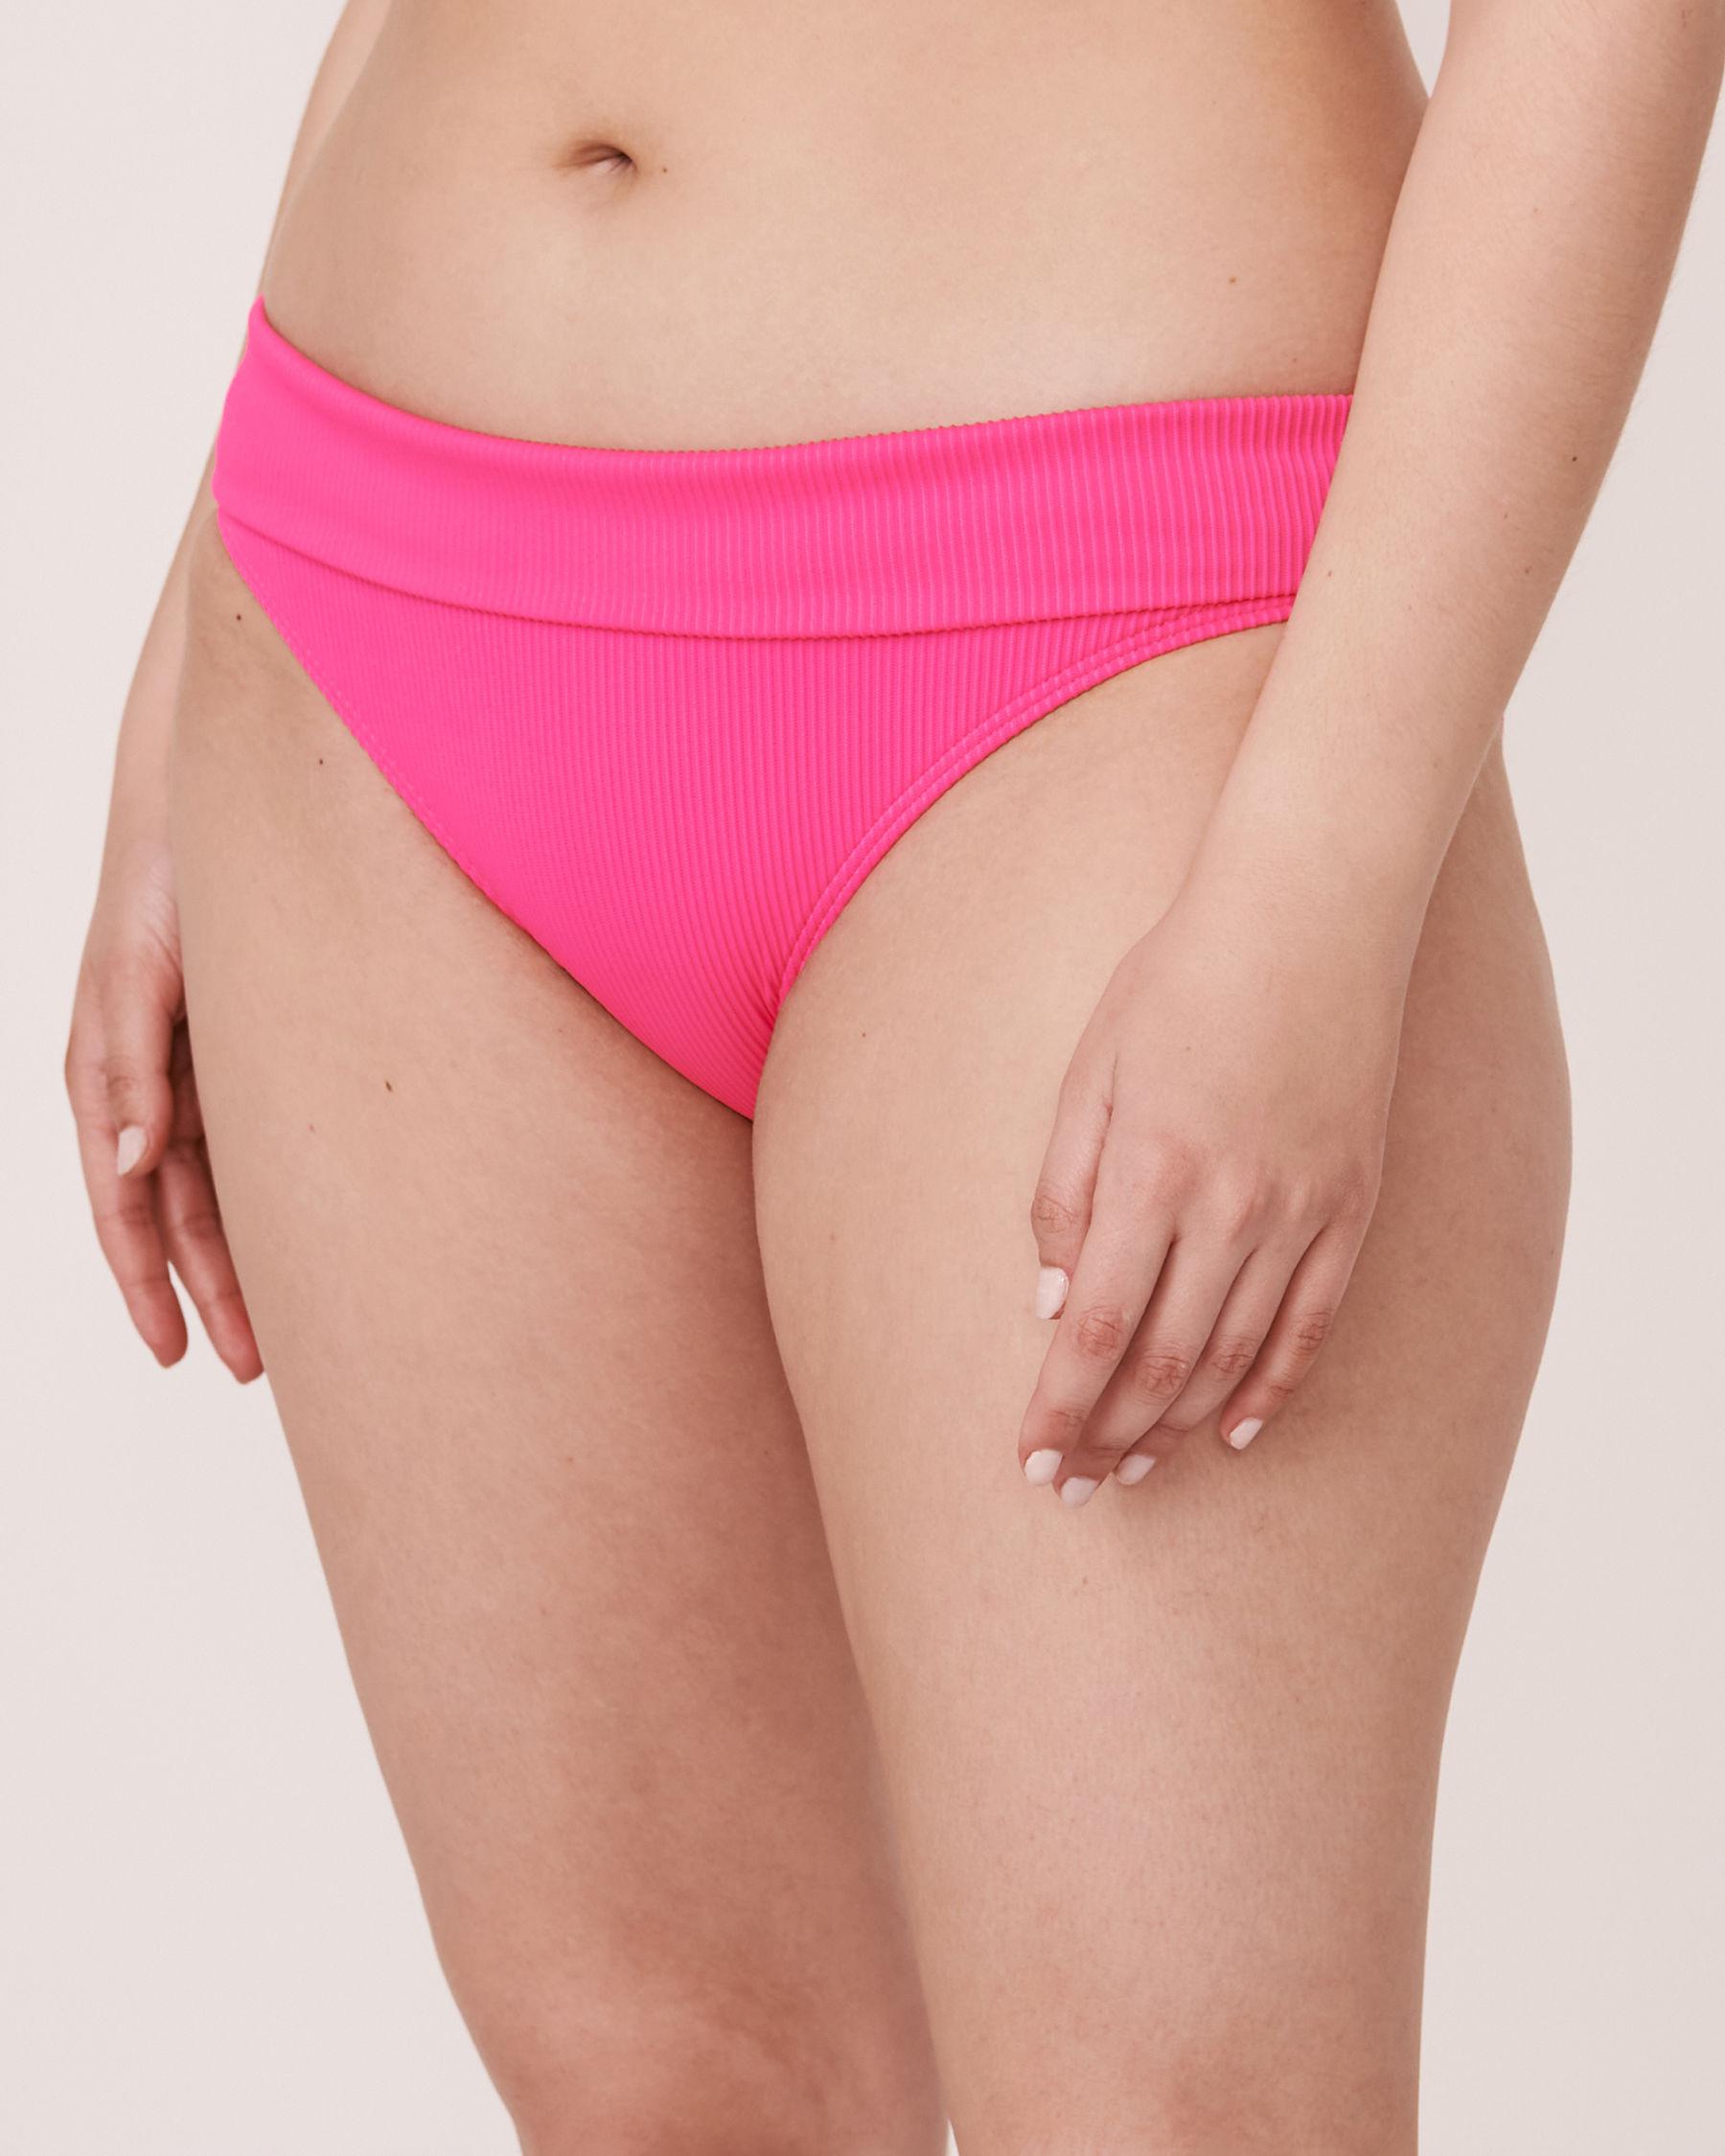 LA VIE EN ROSE AQUA Bas de bikini bande de taille pliable en fibres recyclées TOOTSIE RIB Rose néon 70300063 - Voir1